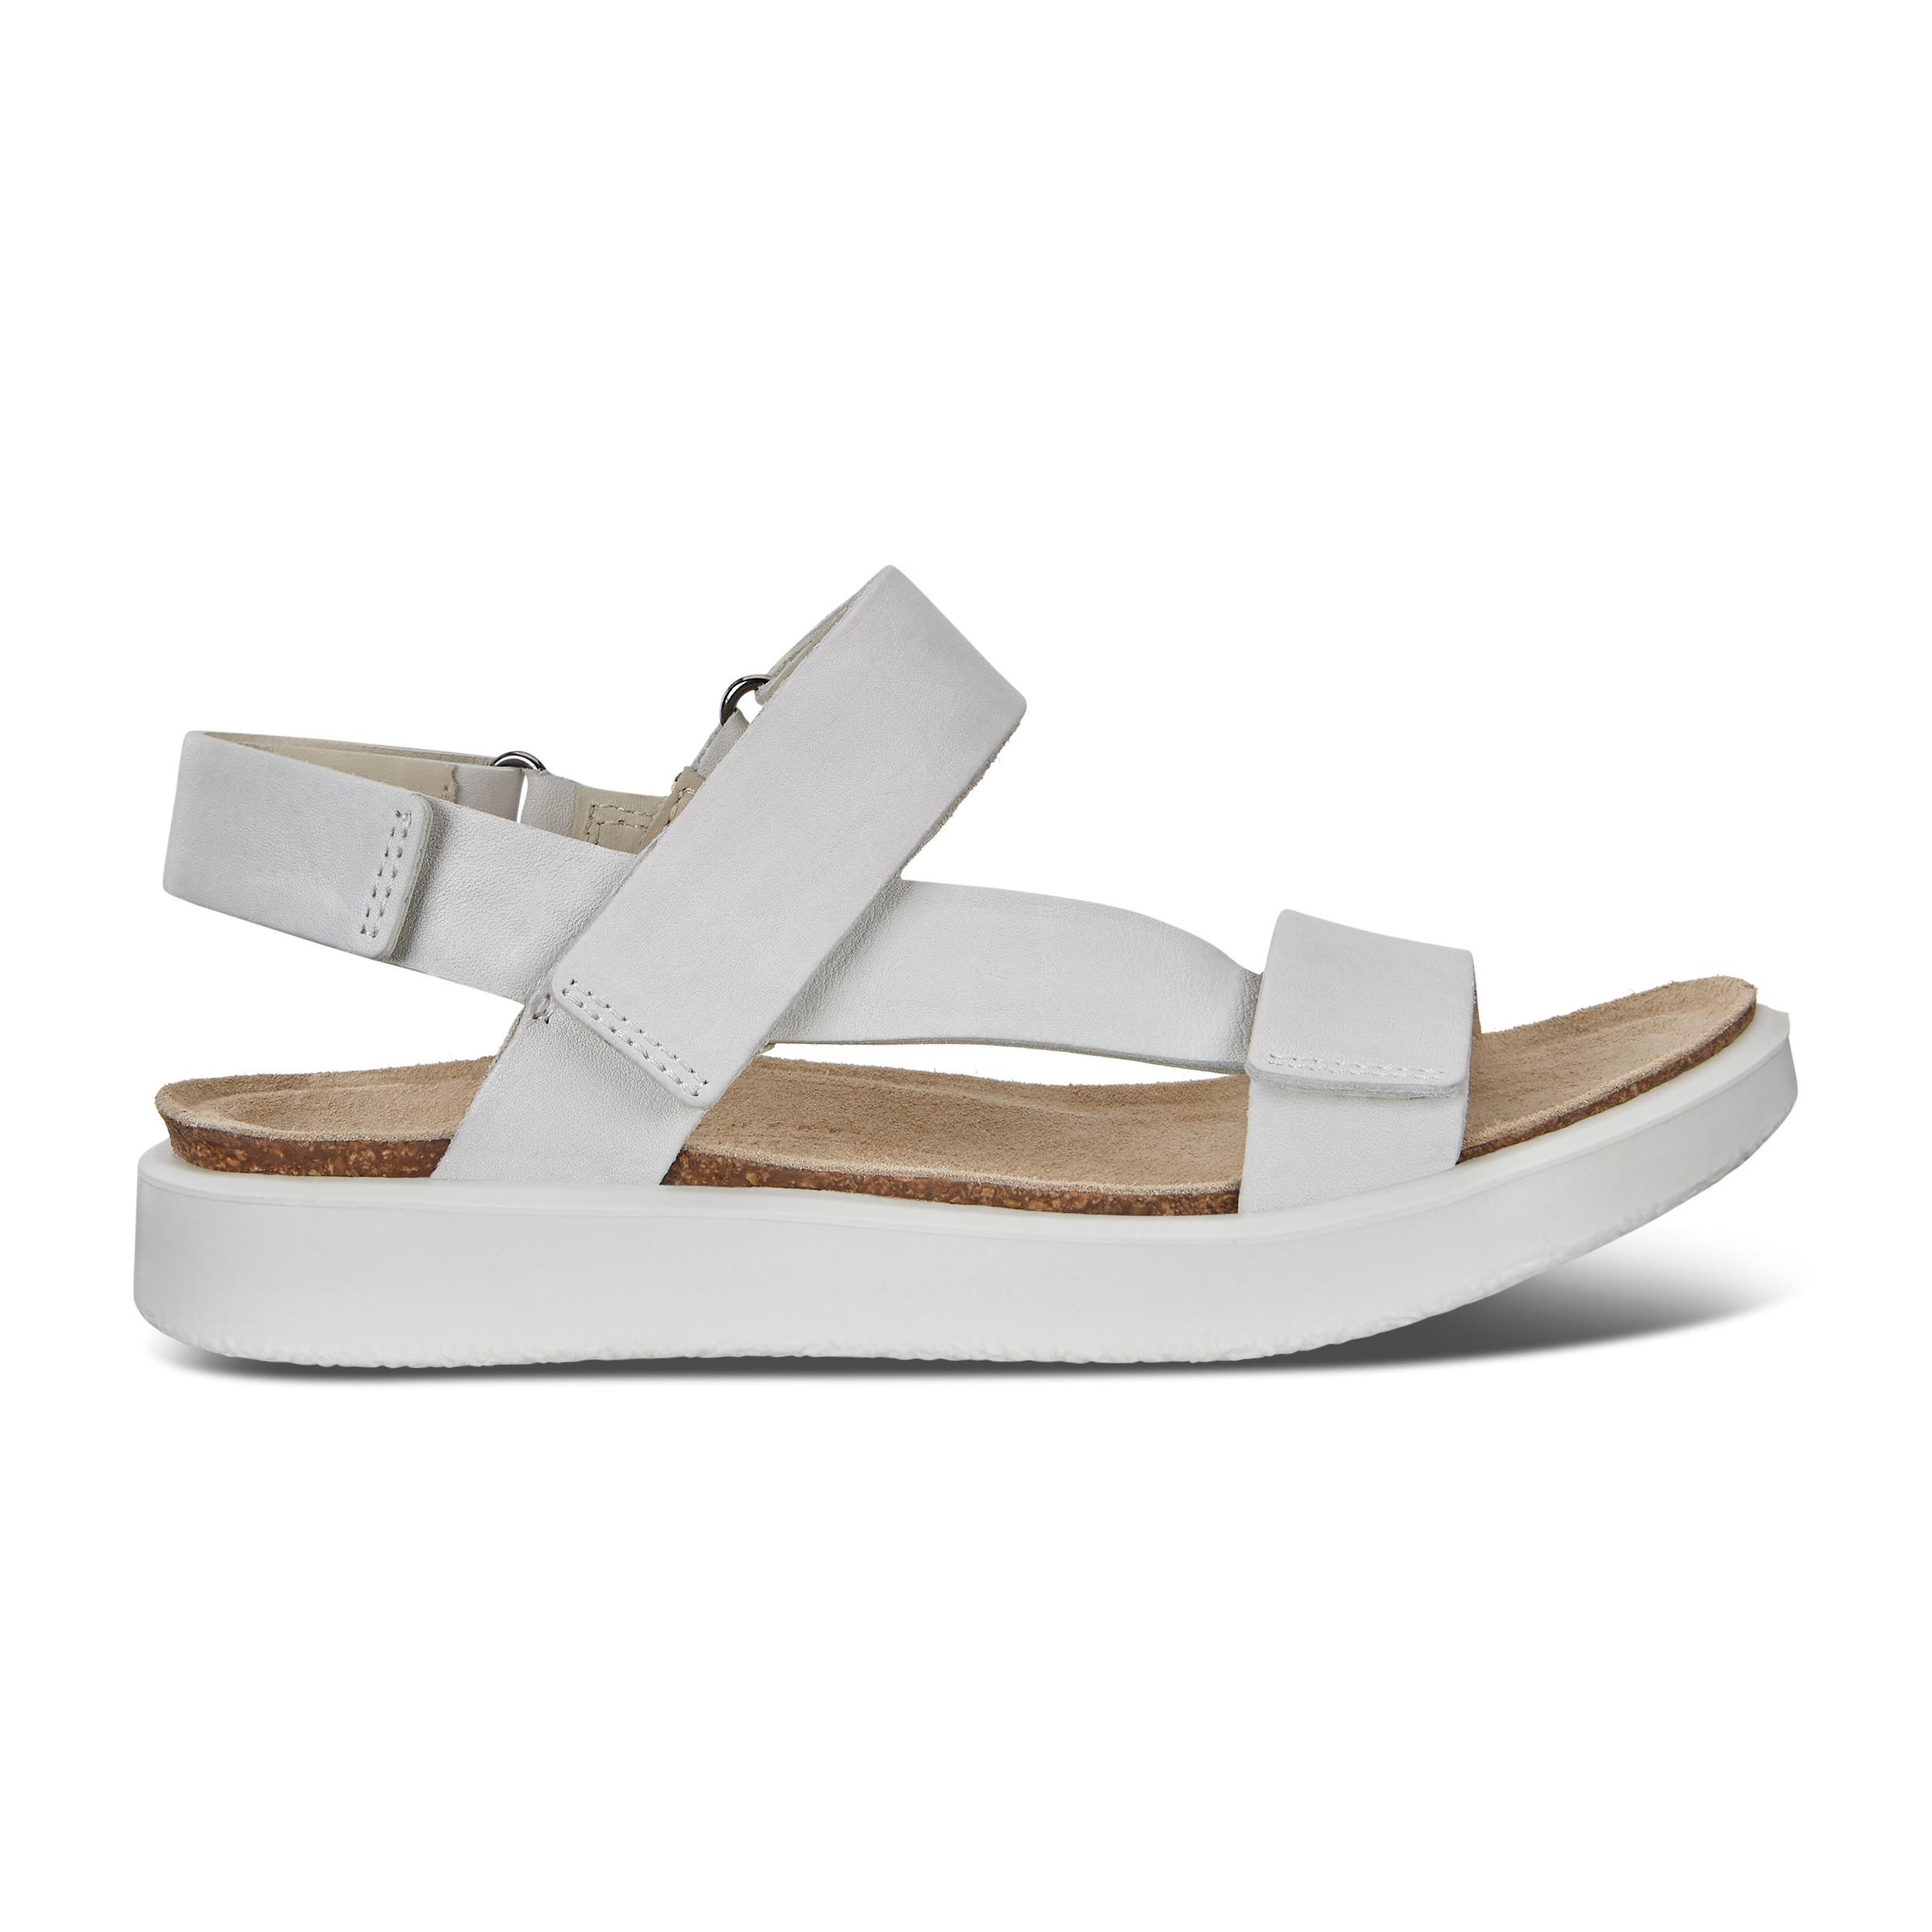 UPC 809704946535 product image for ECCO Corksphere Sandal W Size 9-9.5 White | upcitemdb.com